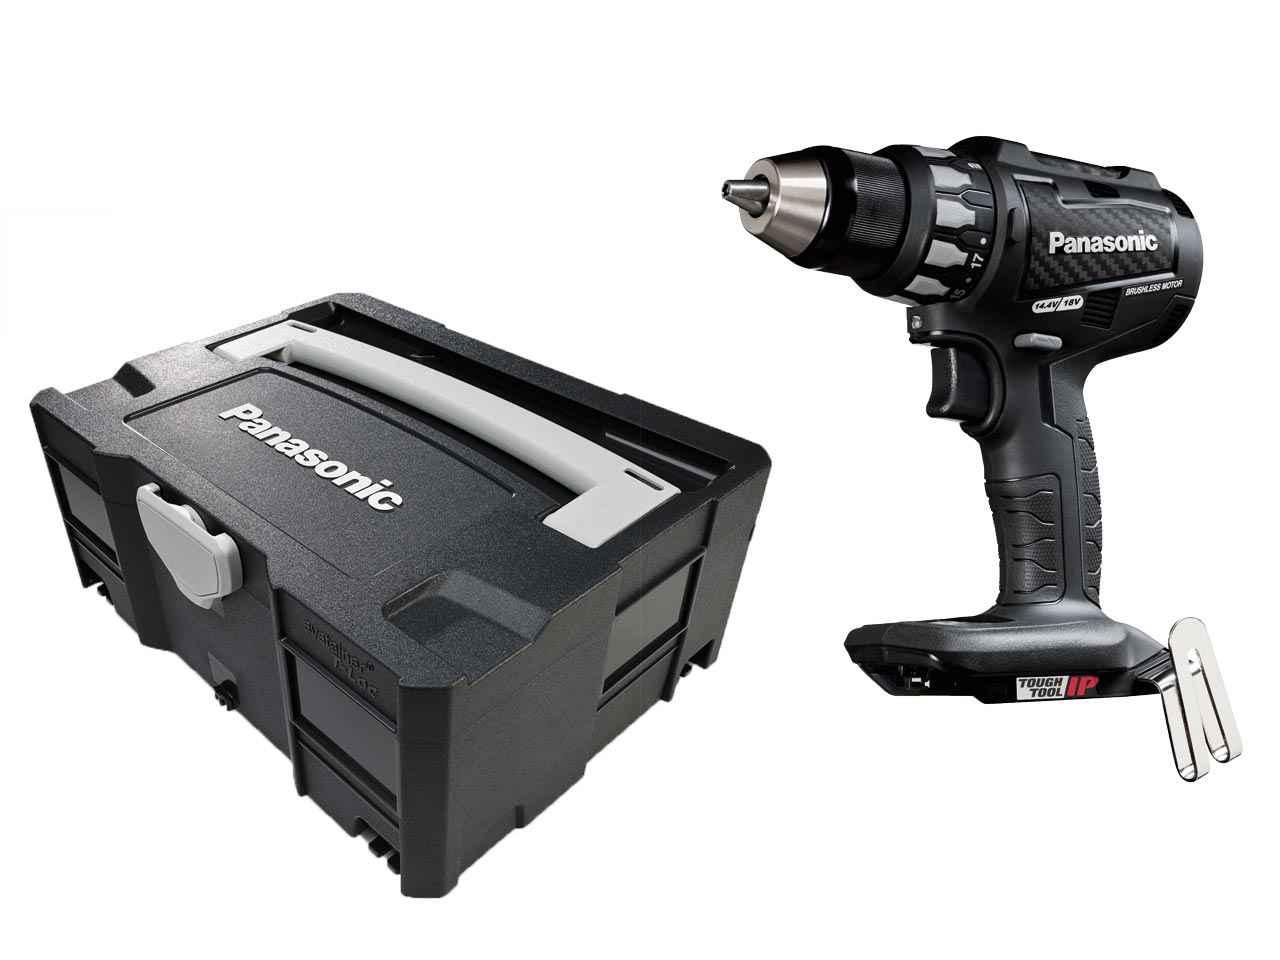 Panasonic EY74A2X 18v//14.4v Brushless Drill Driver Bare Unit SYS T-LOC